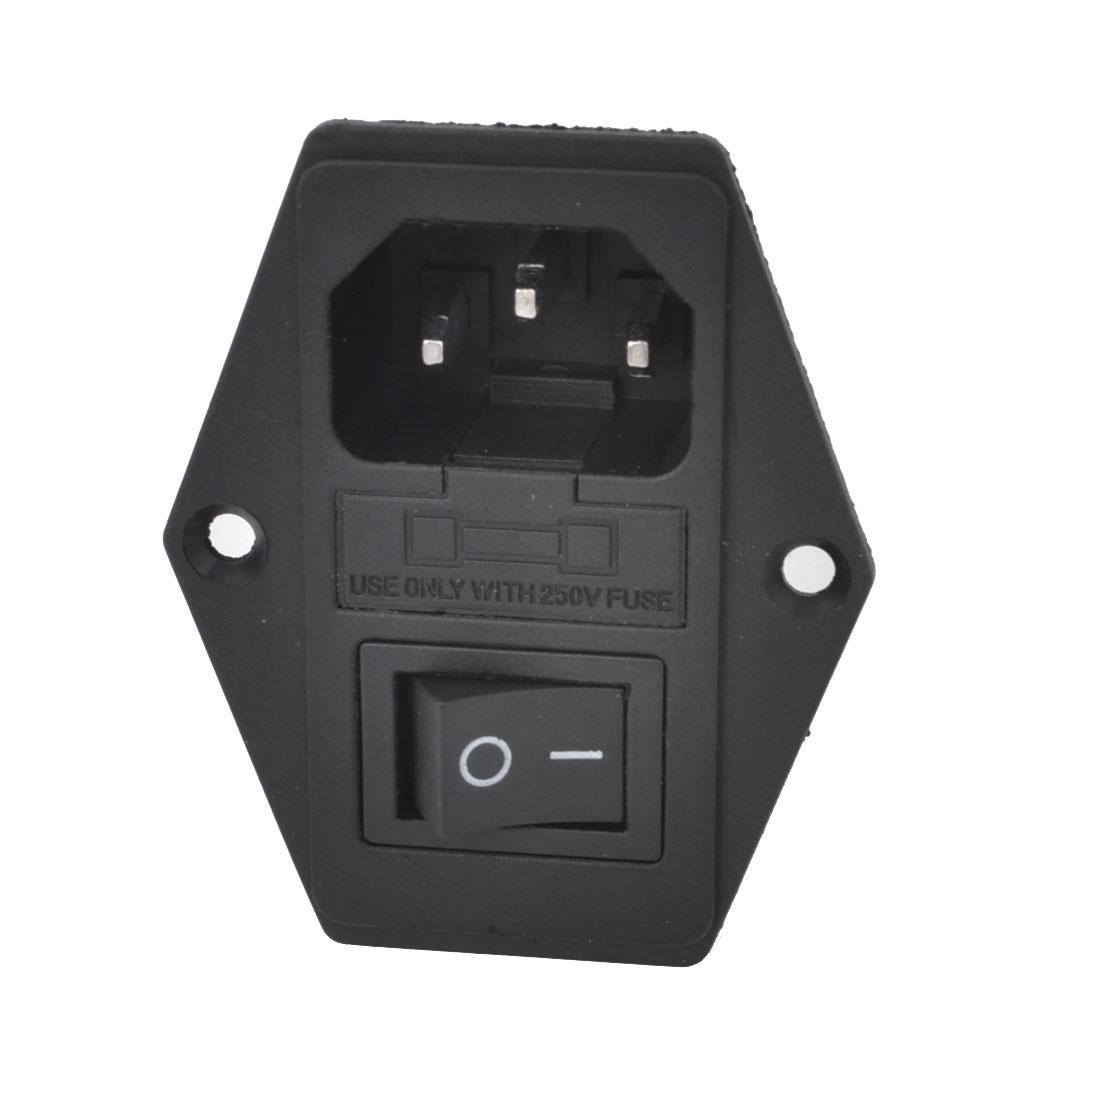 AC 250V 10A ON/OFF Rocker Switch Power Inlet Socket w Fuse Holder